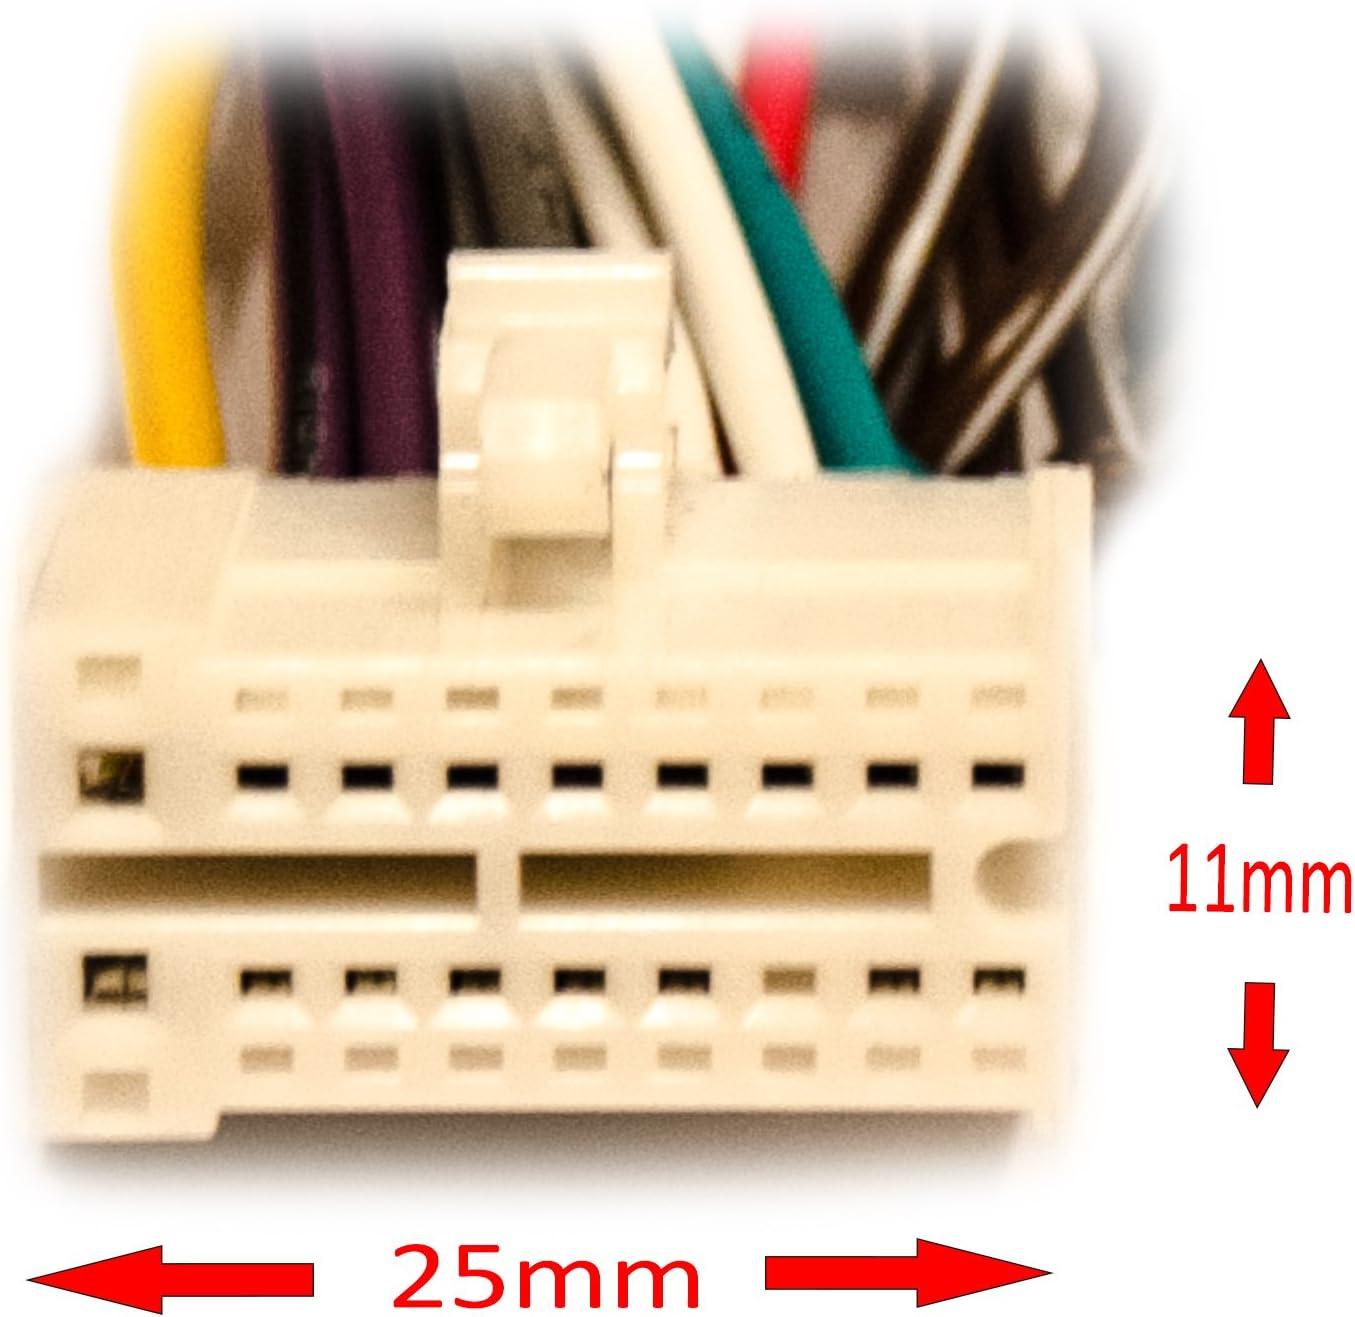 Autoradio Ersatzkabel Adapter Für Clarion Nx Nz Vb Elektronik